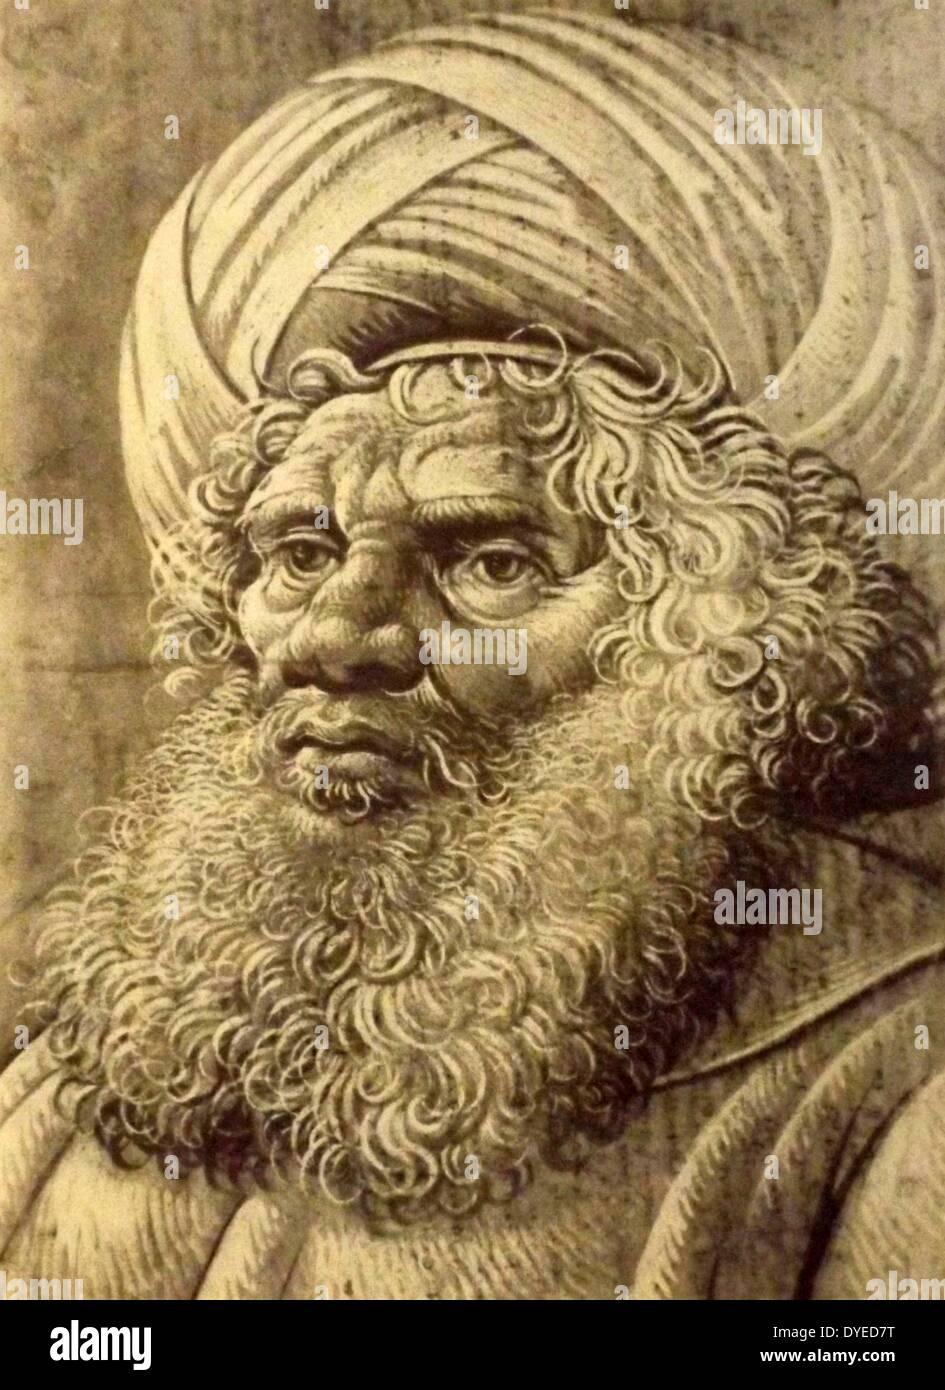 Head of a Bearded Man Wearing a Turban - Stock Image